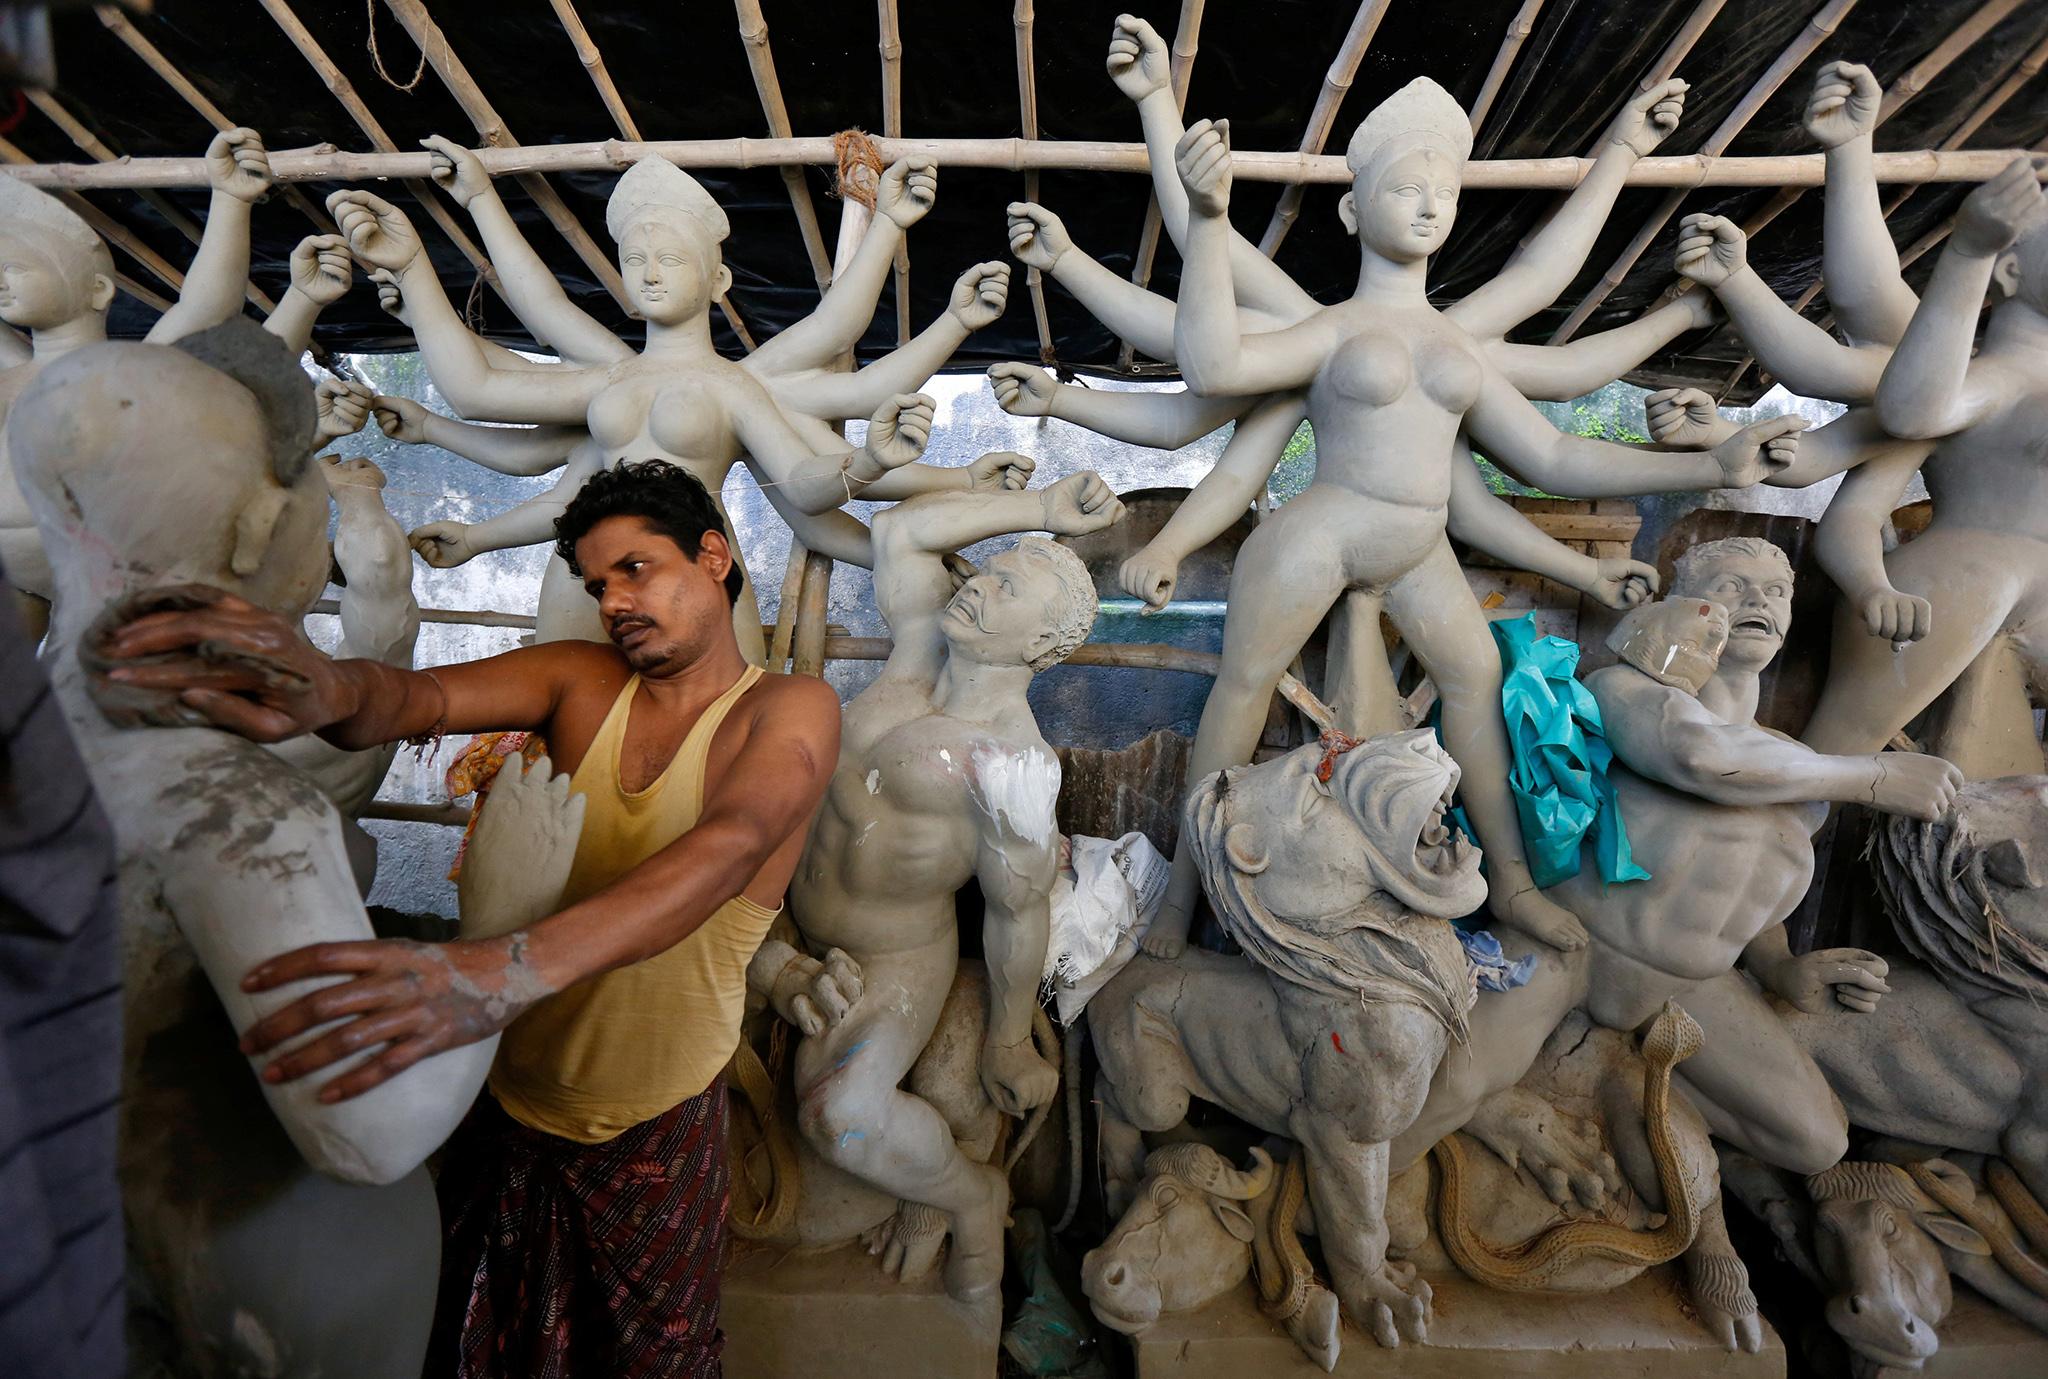 An artisan works on an idol of Hindu goddess Durga at a workshop ahead of the Durga Puja festival in Kolkata, India